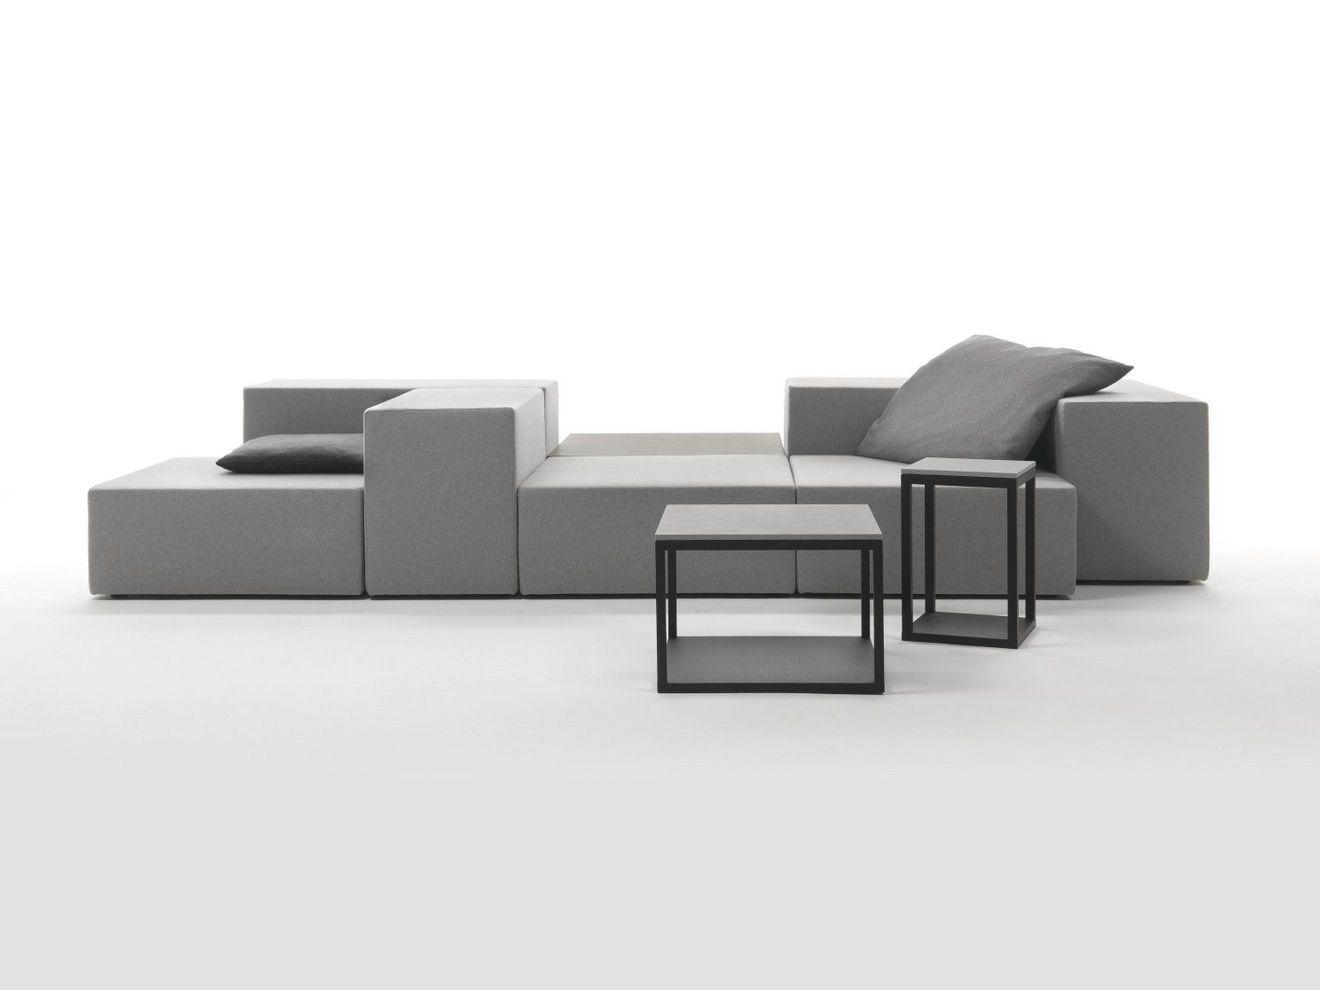 Sectional Modular Sofa Lounge Lounge Collection By Giulio Marelli Italia Design M P Studio Modular Sofa Design Modern Modular Sofas Modern Sofa Sectional